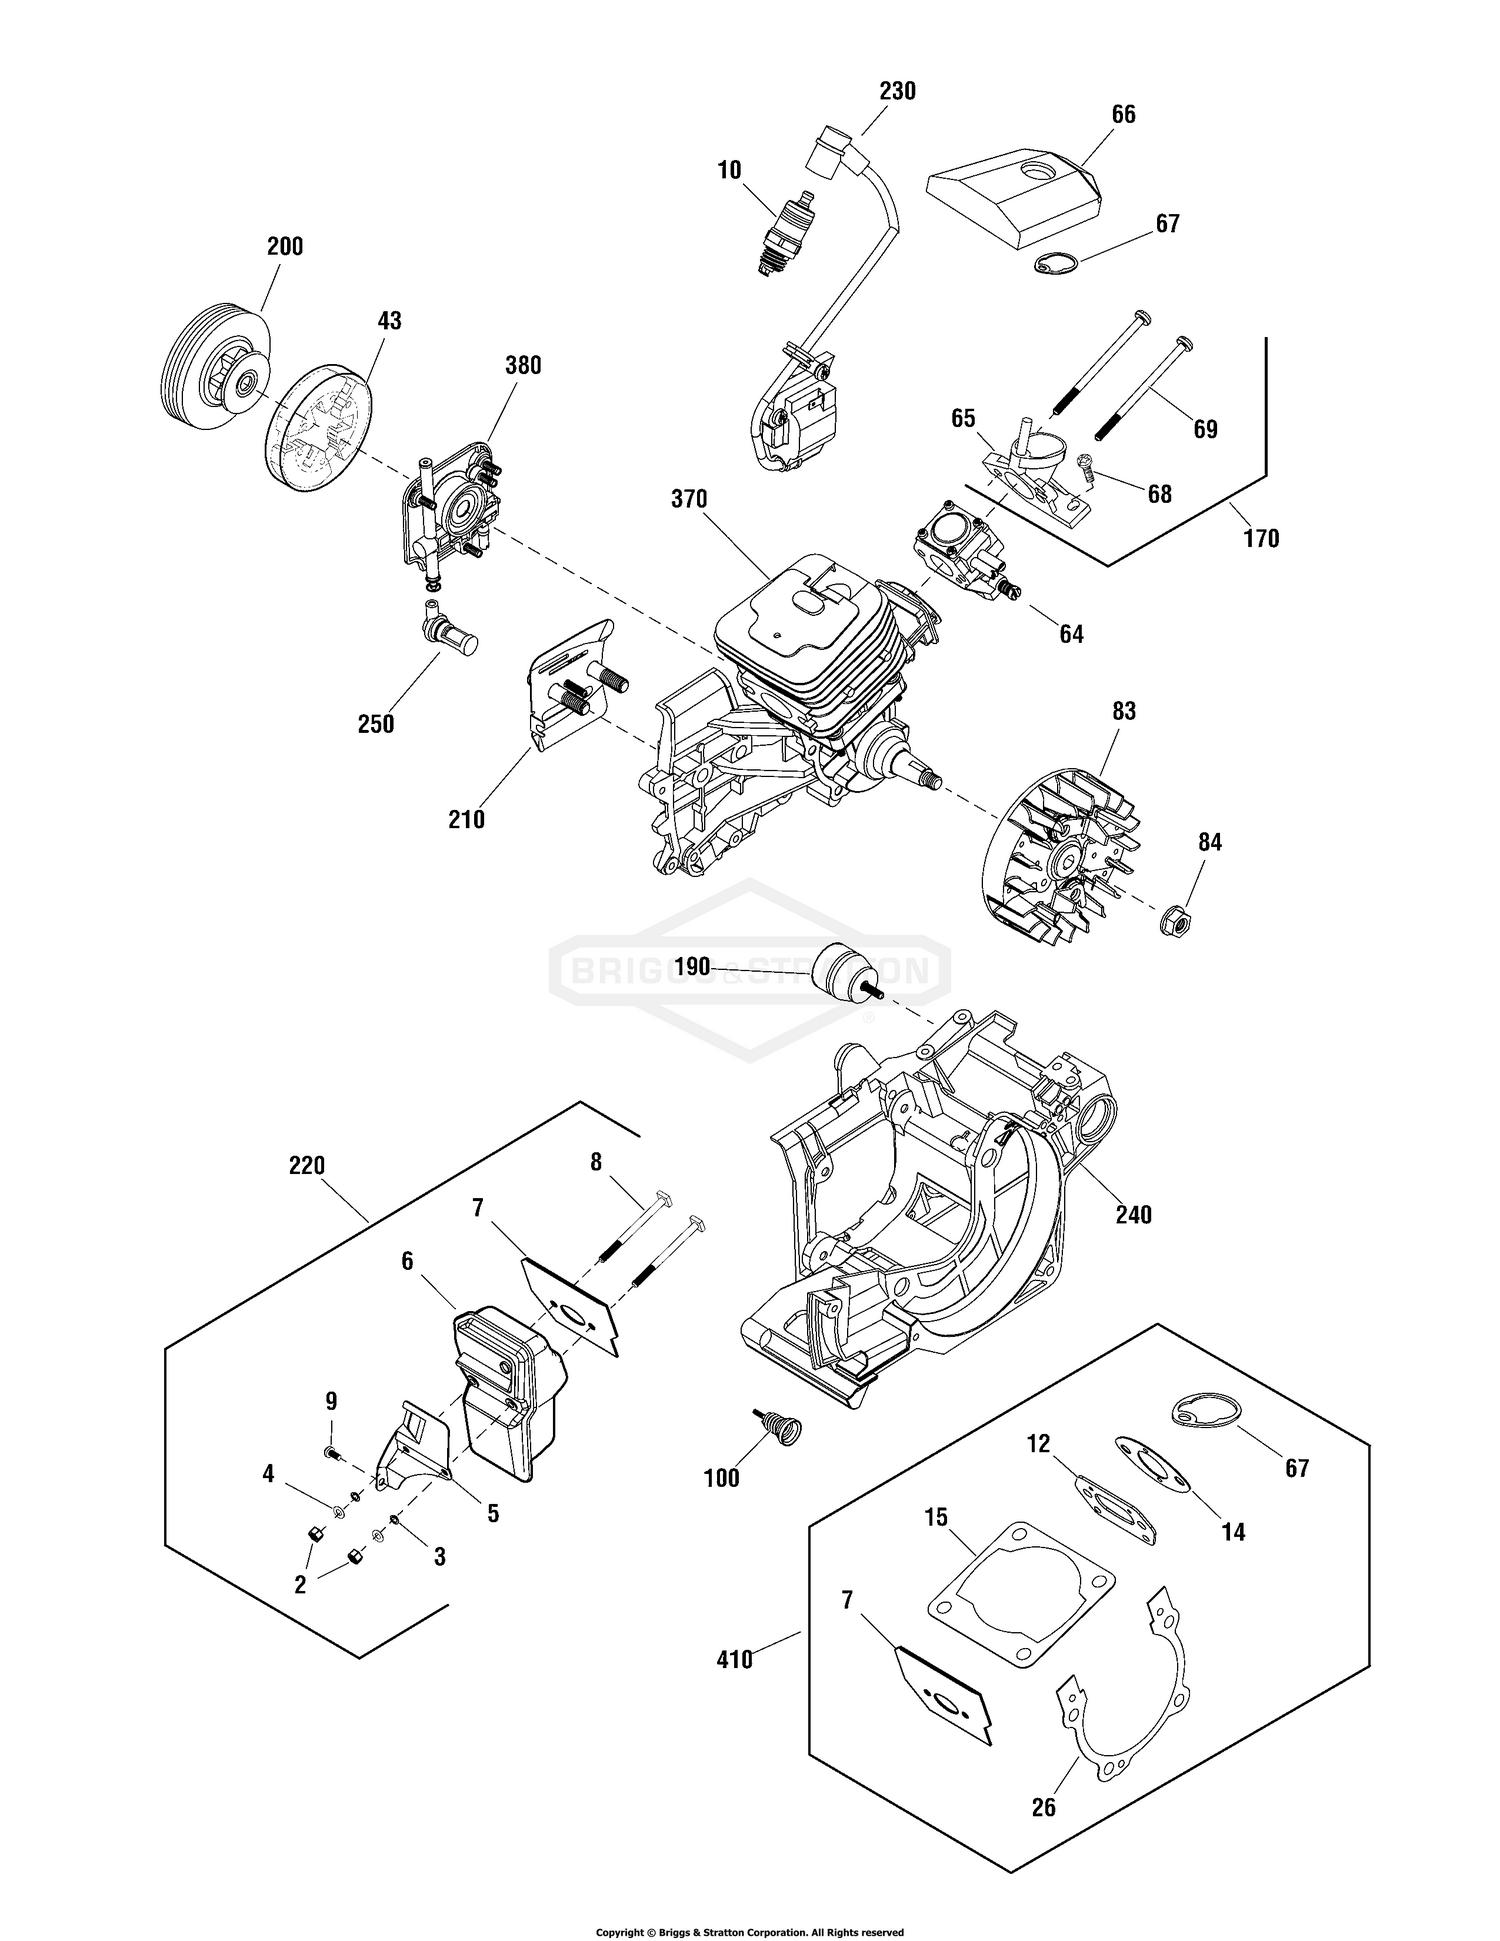 [WLLP_2054]   WG_2076] Chainsaw Engine Diagram Free Diagram   Briggs Stratton Engine Diagram Chainsaw      Ructi Inrebe Vulg Sarc Bocep Mohammedshrine Librar Wiring 101